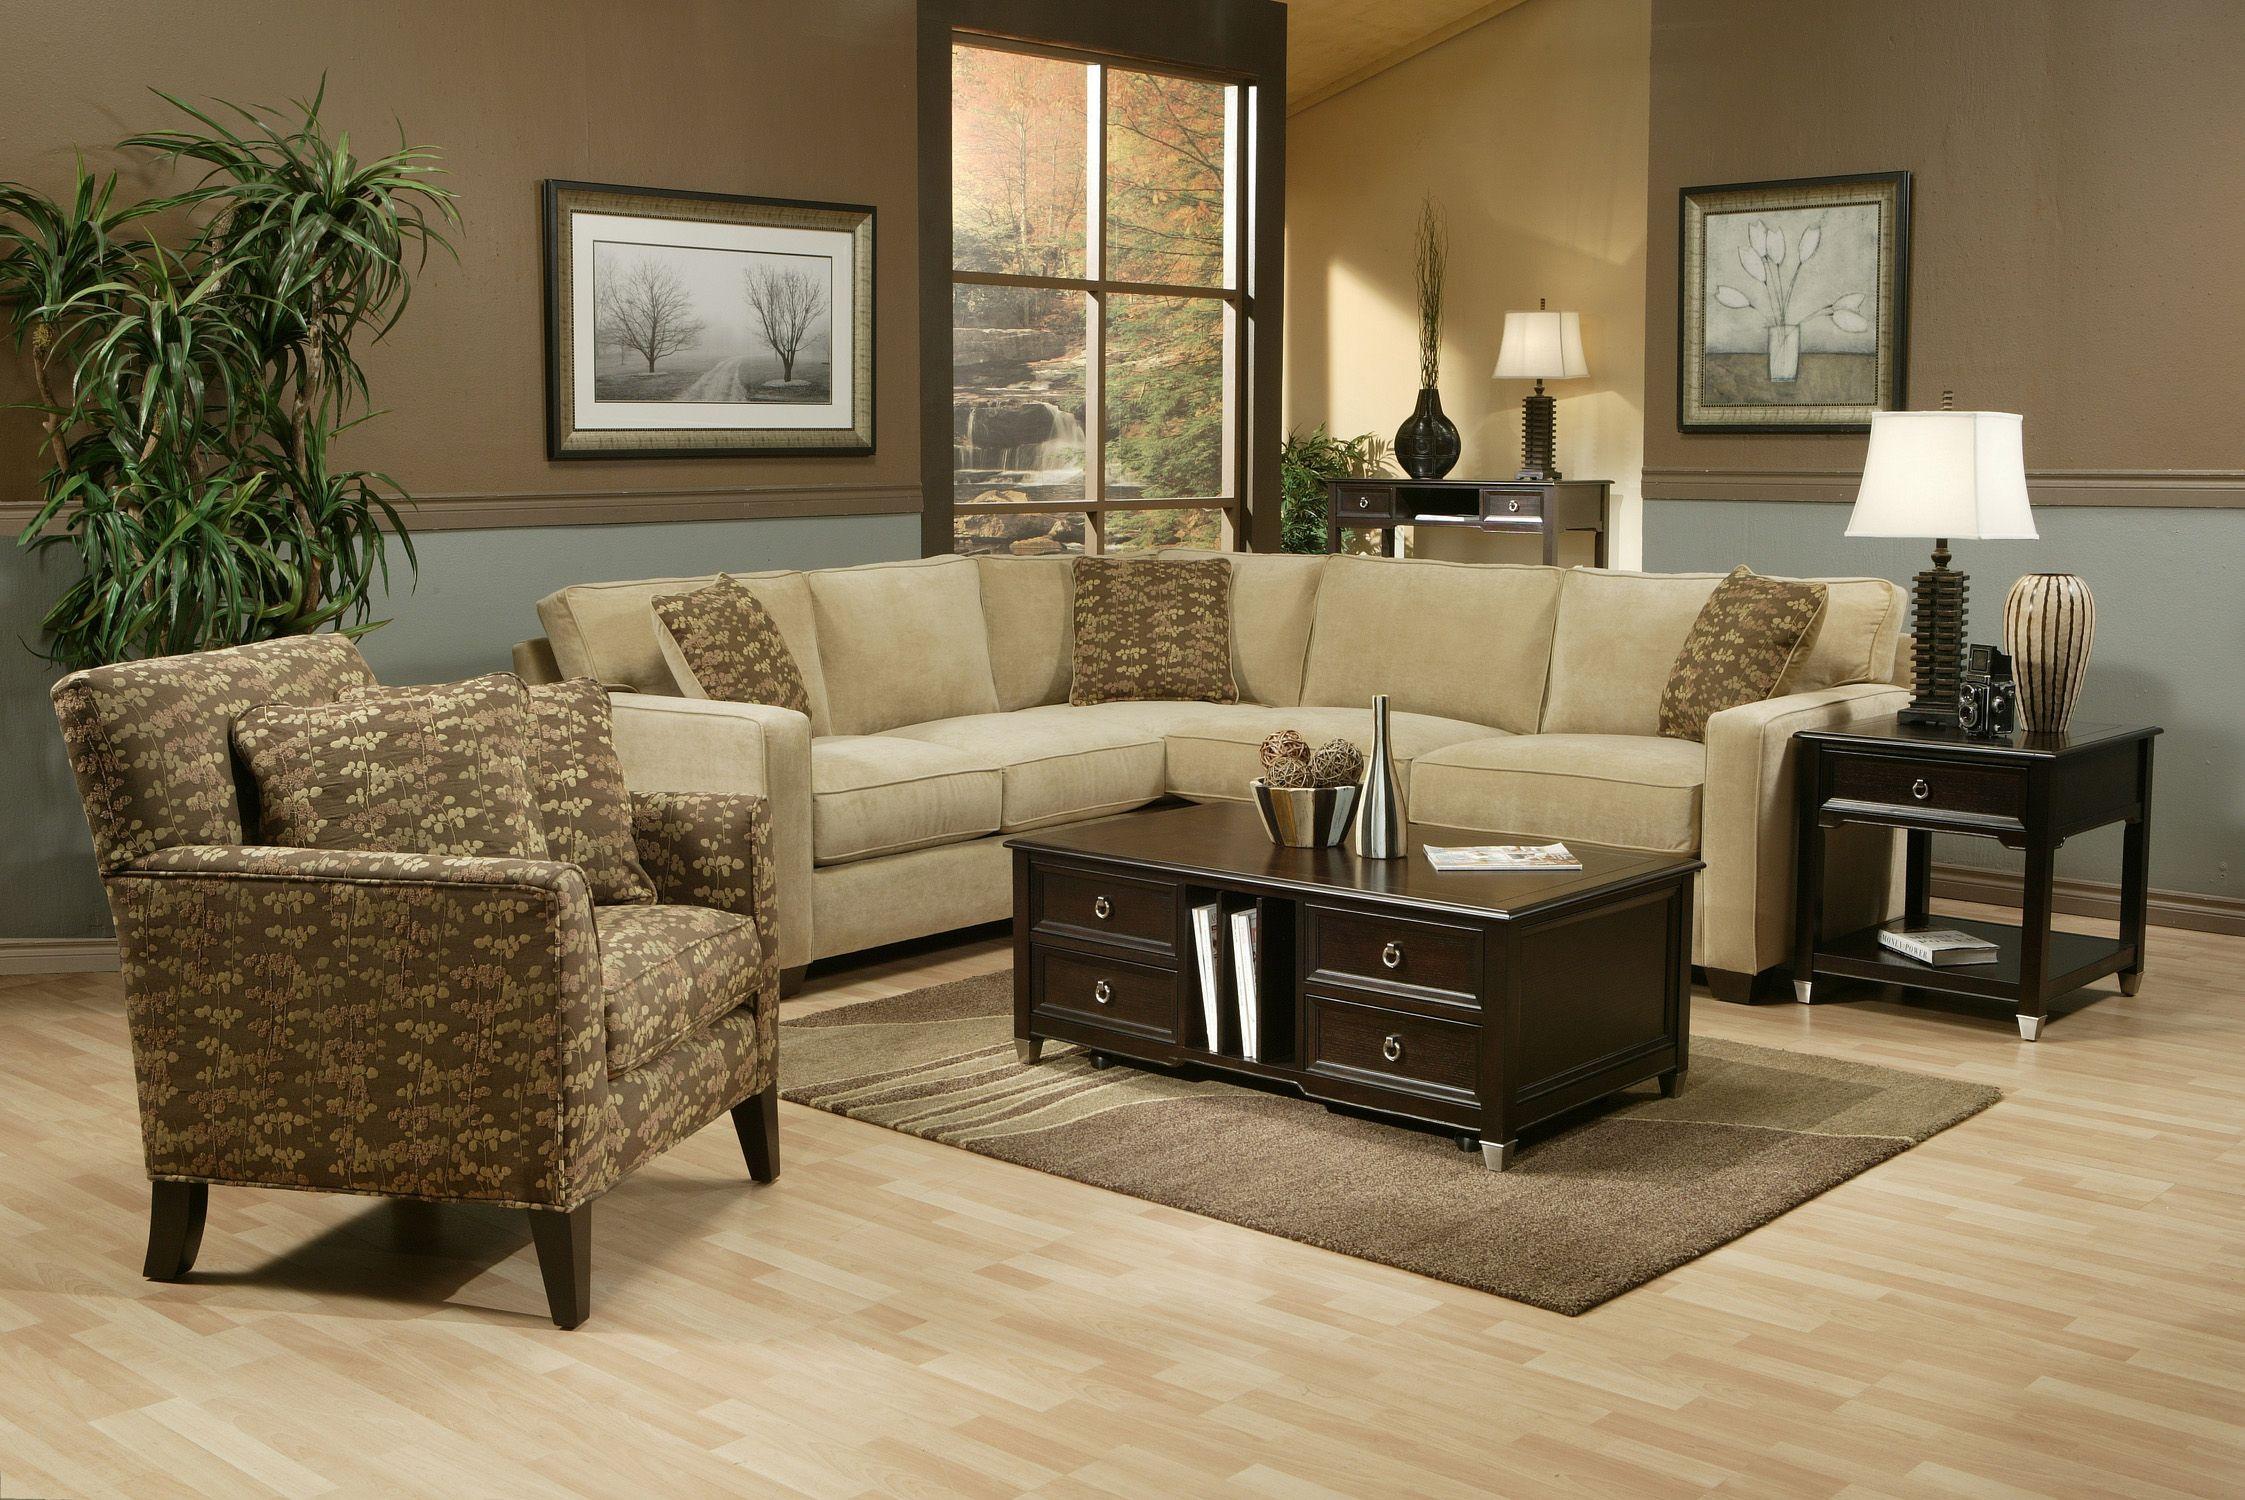 Bradford Sofa Loveseat Chair Ottoman Multiple Sectional